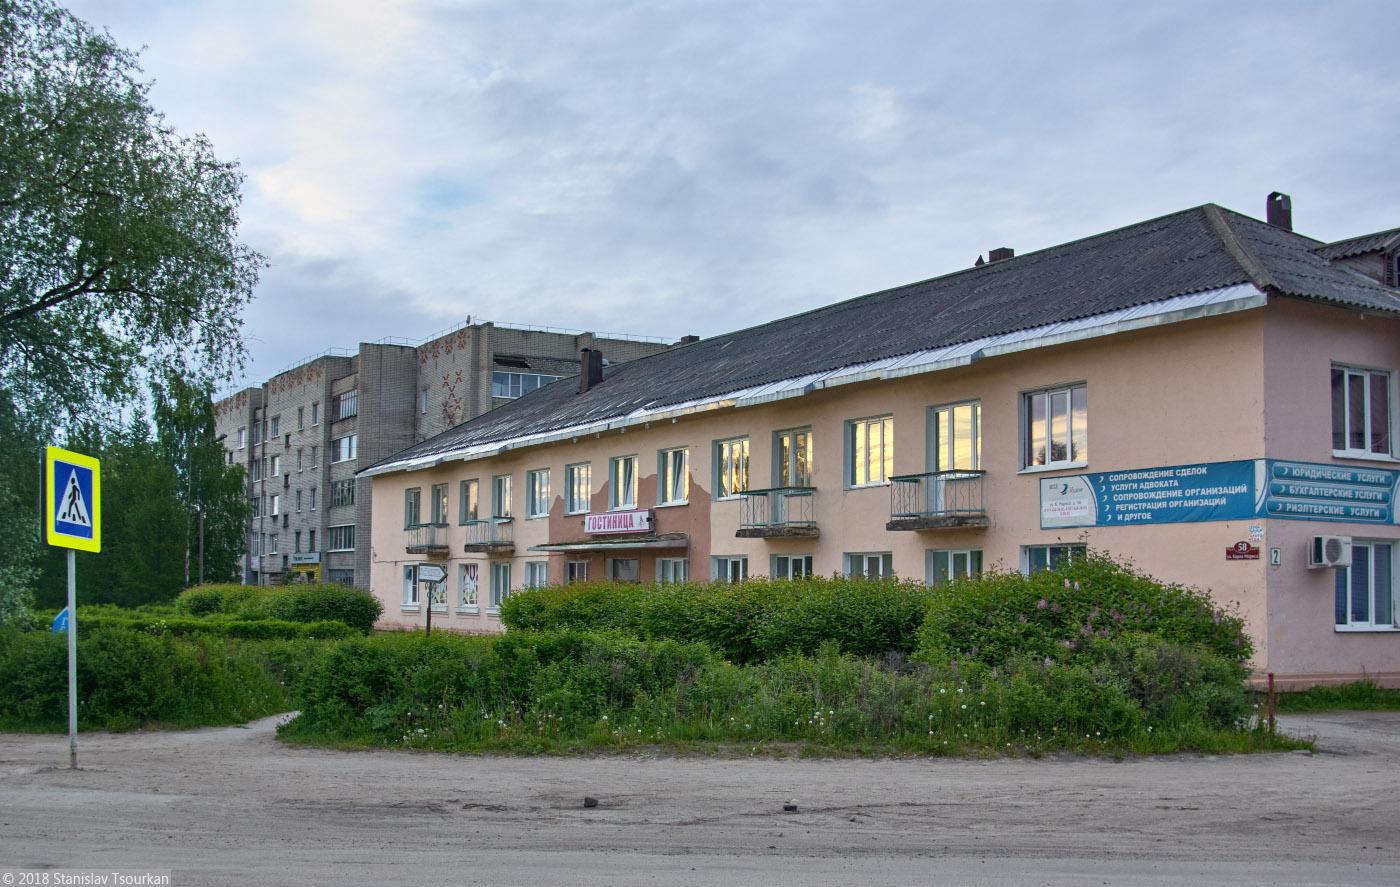 Пудож, Карелия, республика Карелия, гостиница, карелонего